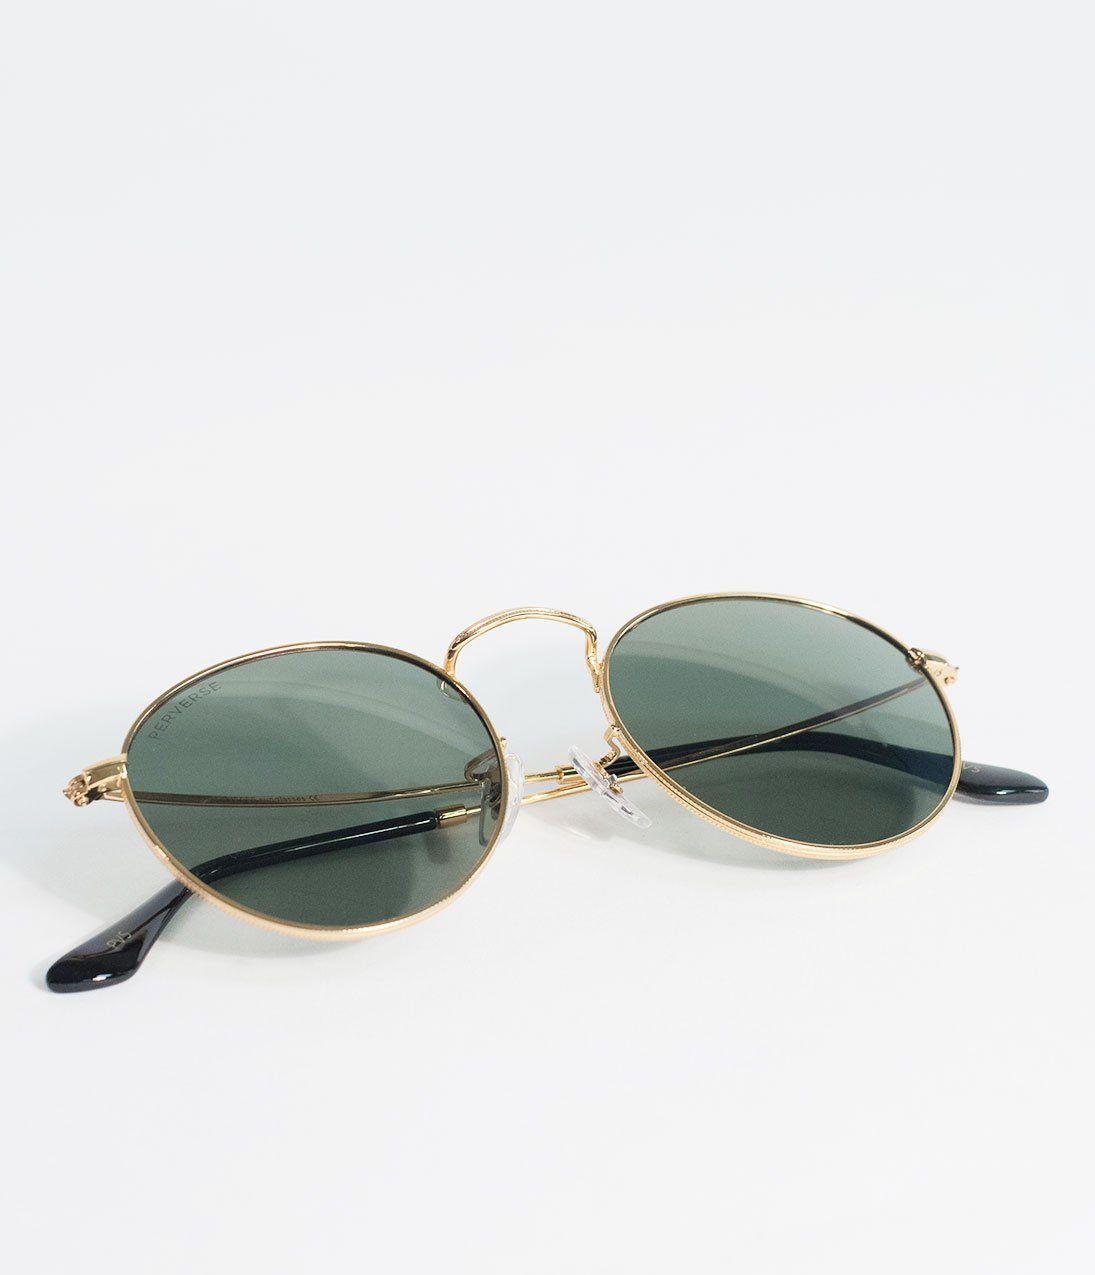 c2191431df Perverse Gold   Green Quarter Orleans Round Sunglasses – Unique Vintage